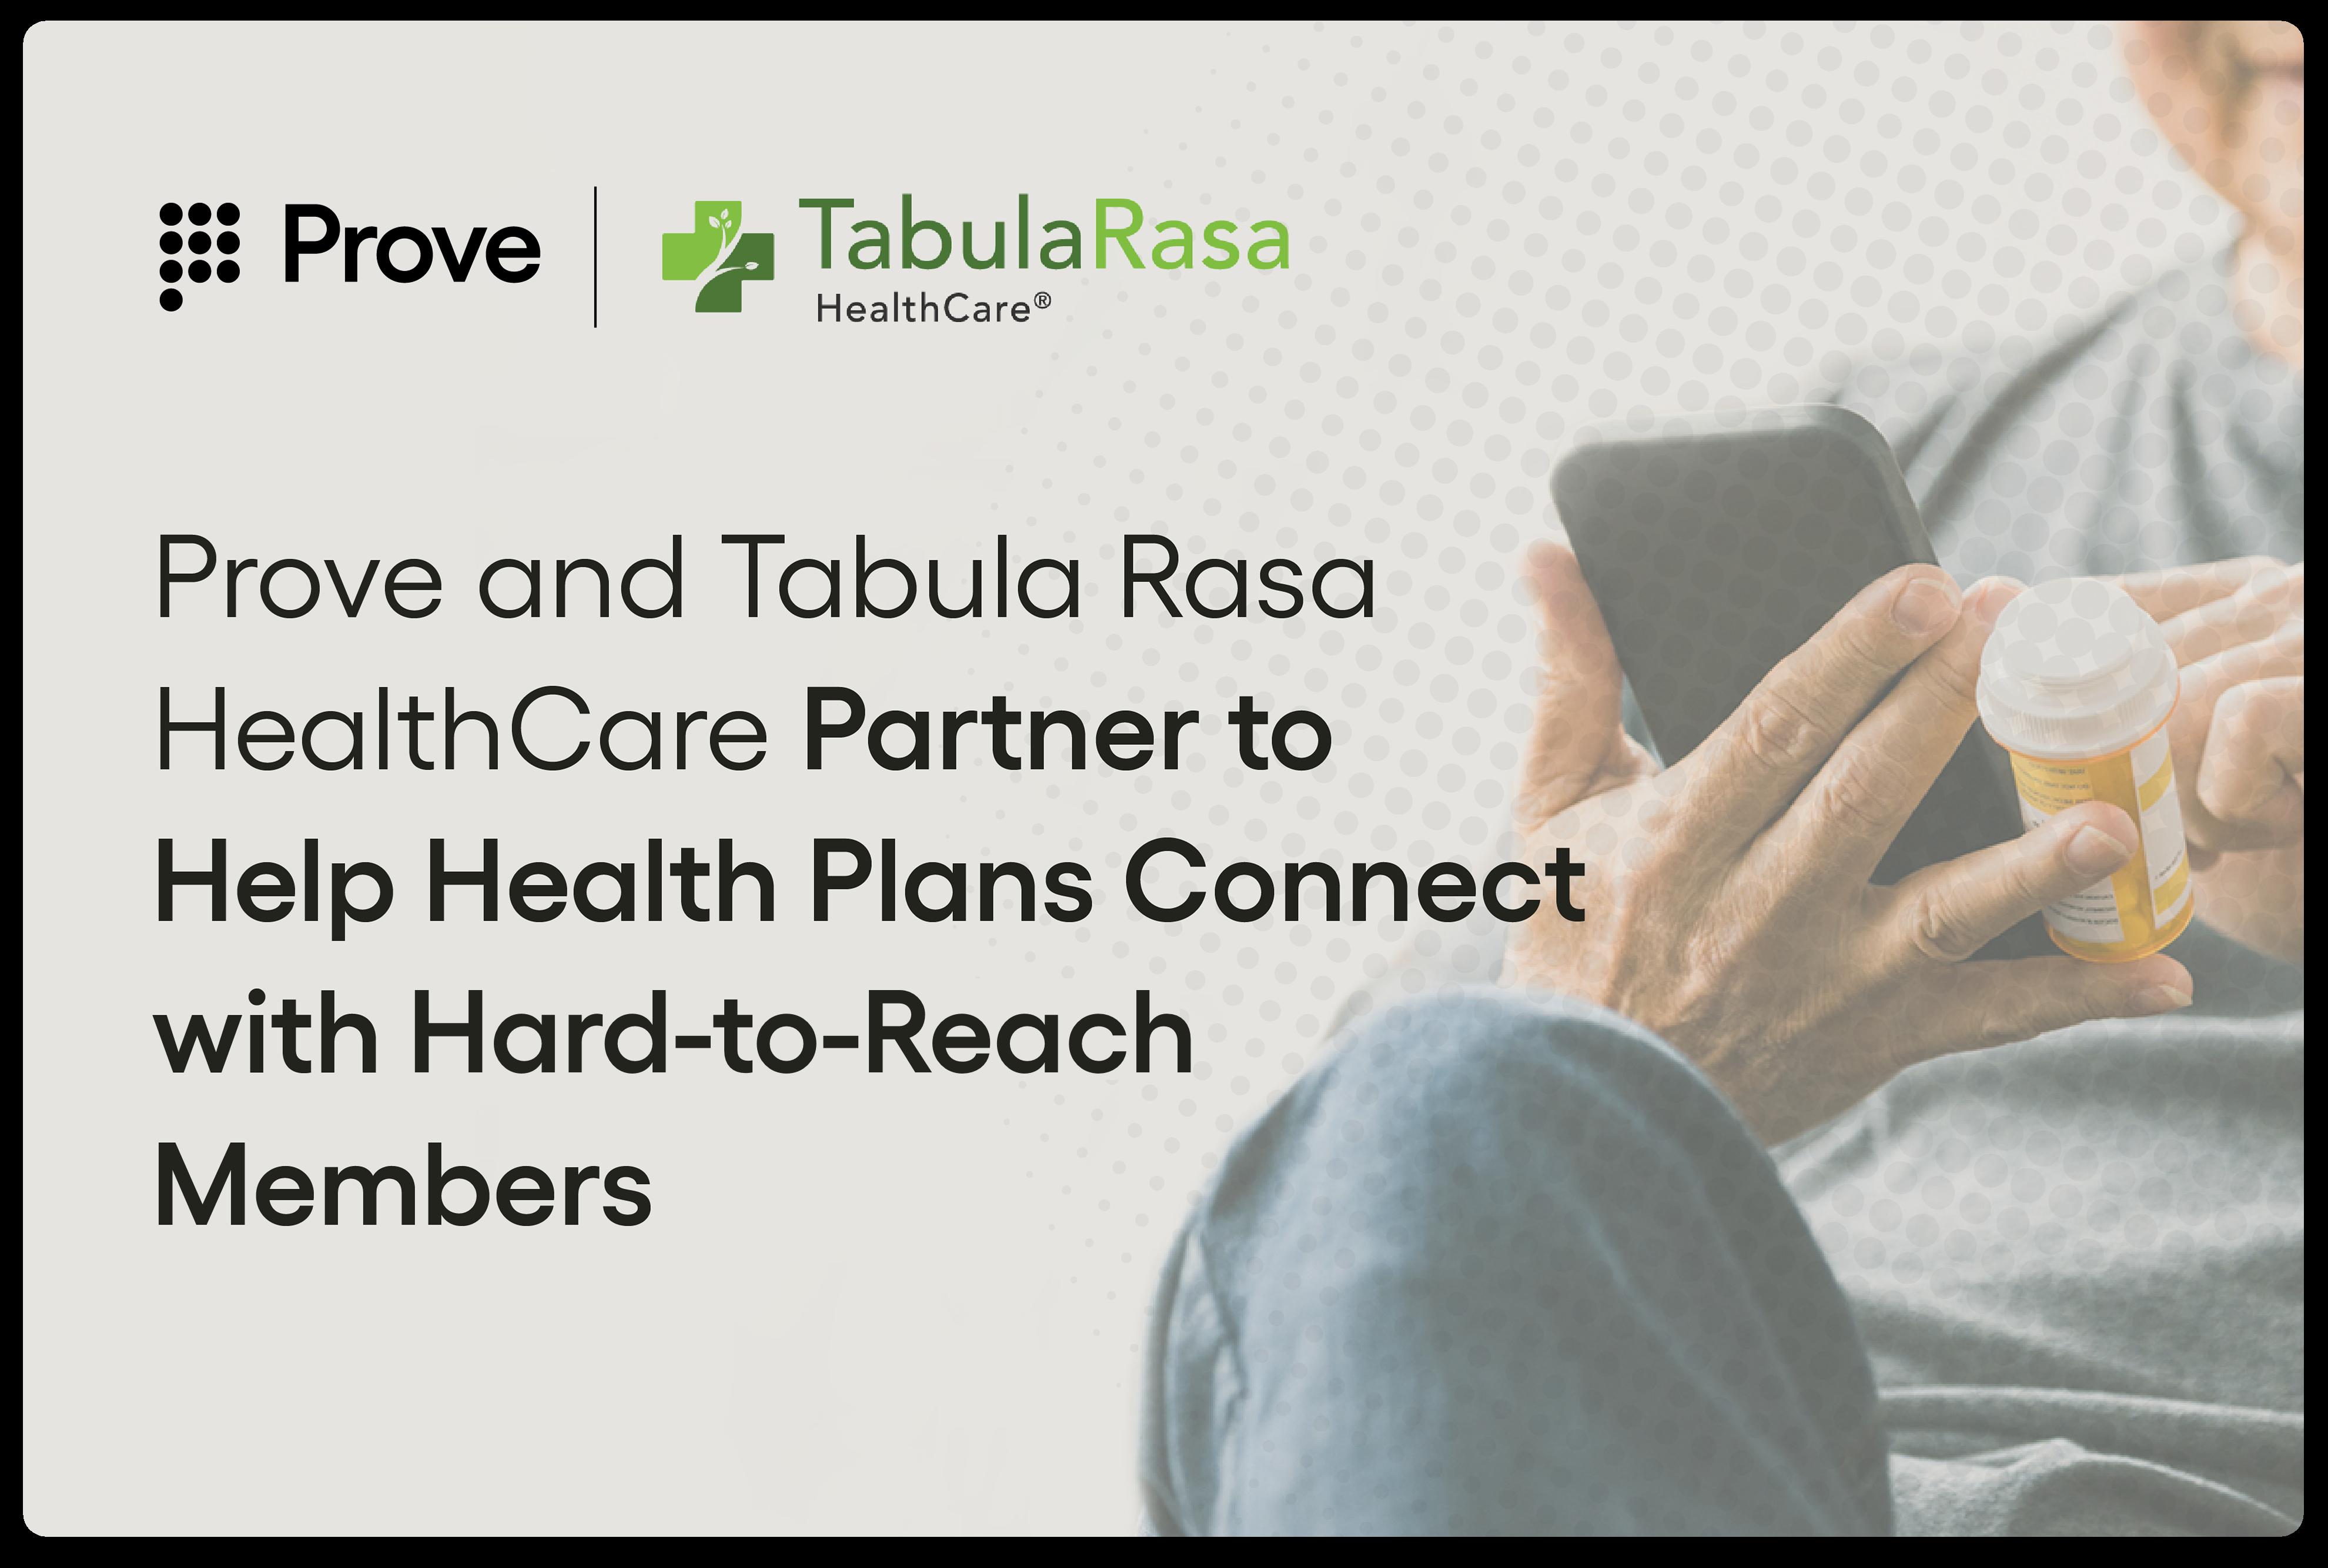 Prove and Tabula Rasa HealthCare Partner to Optimize Member Engagement